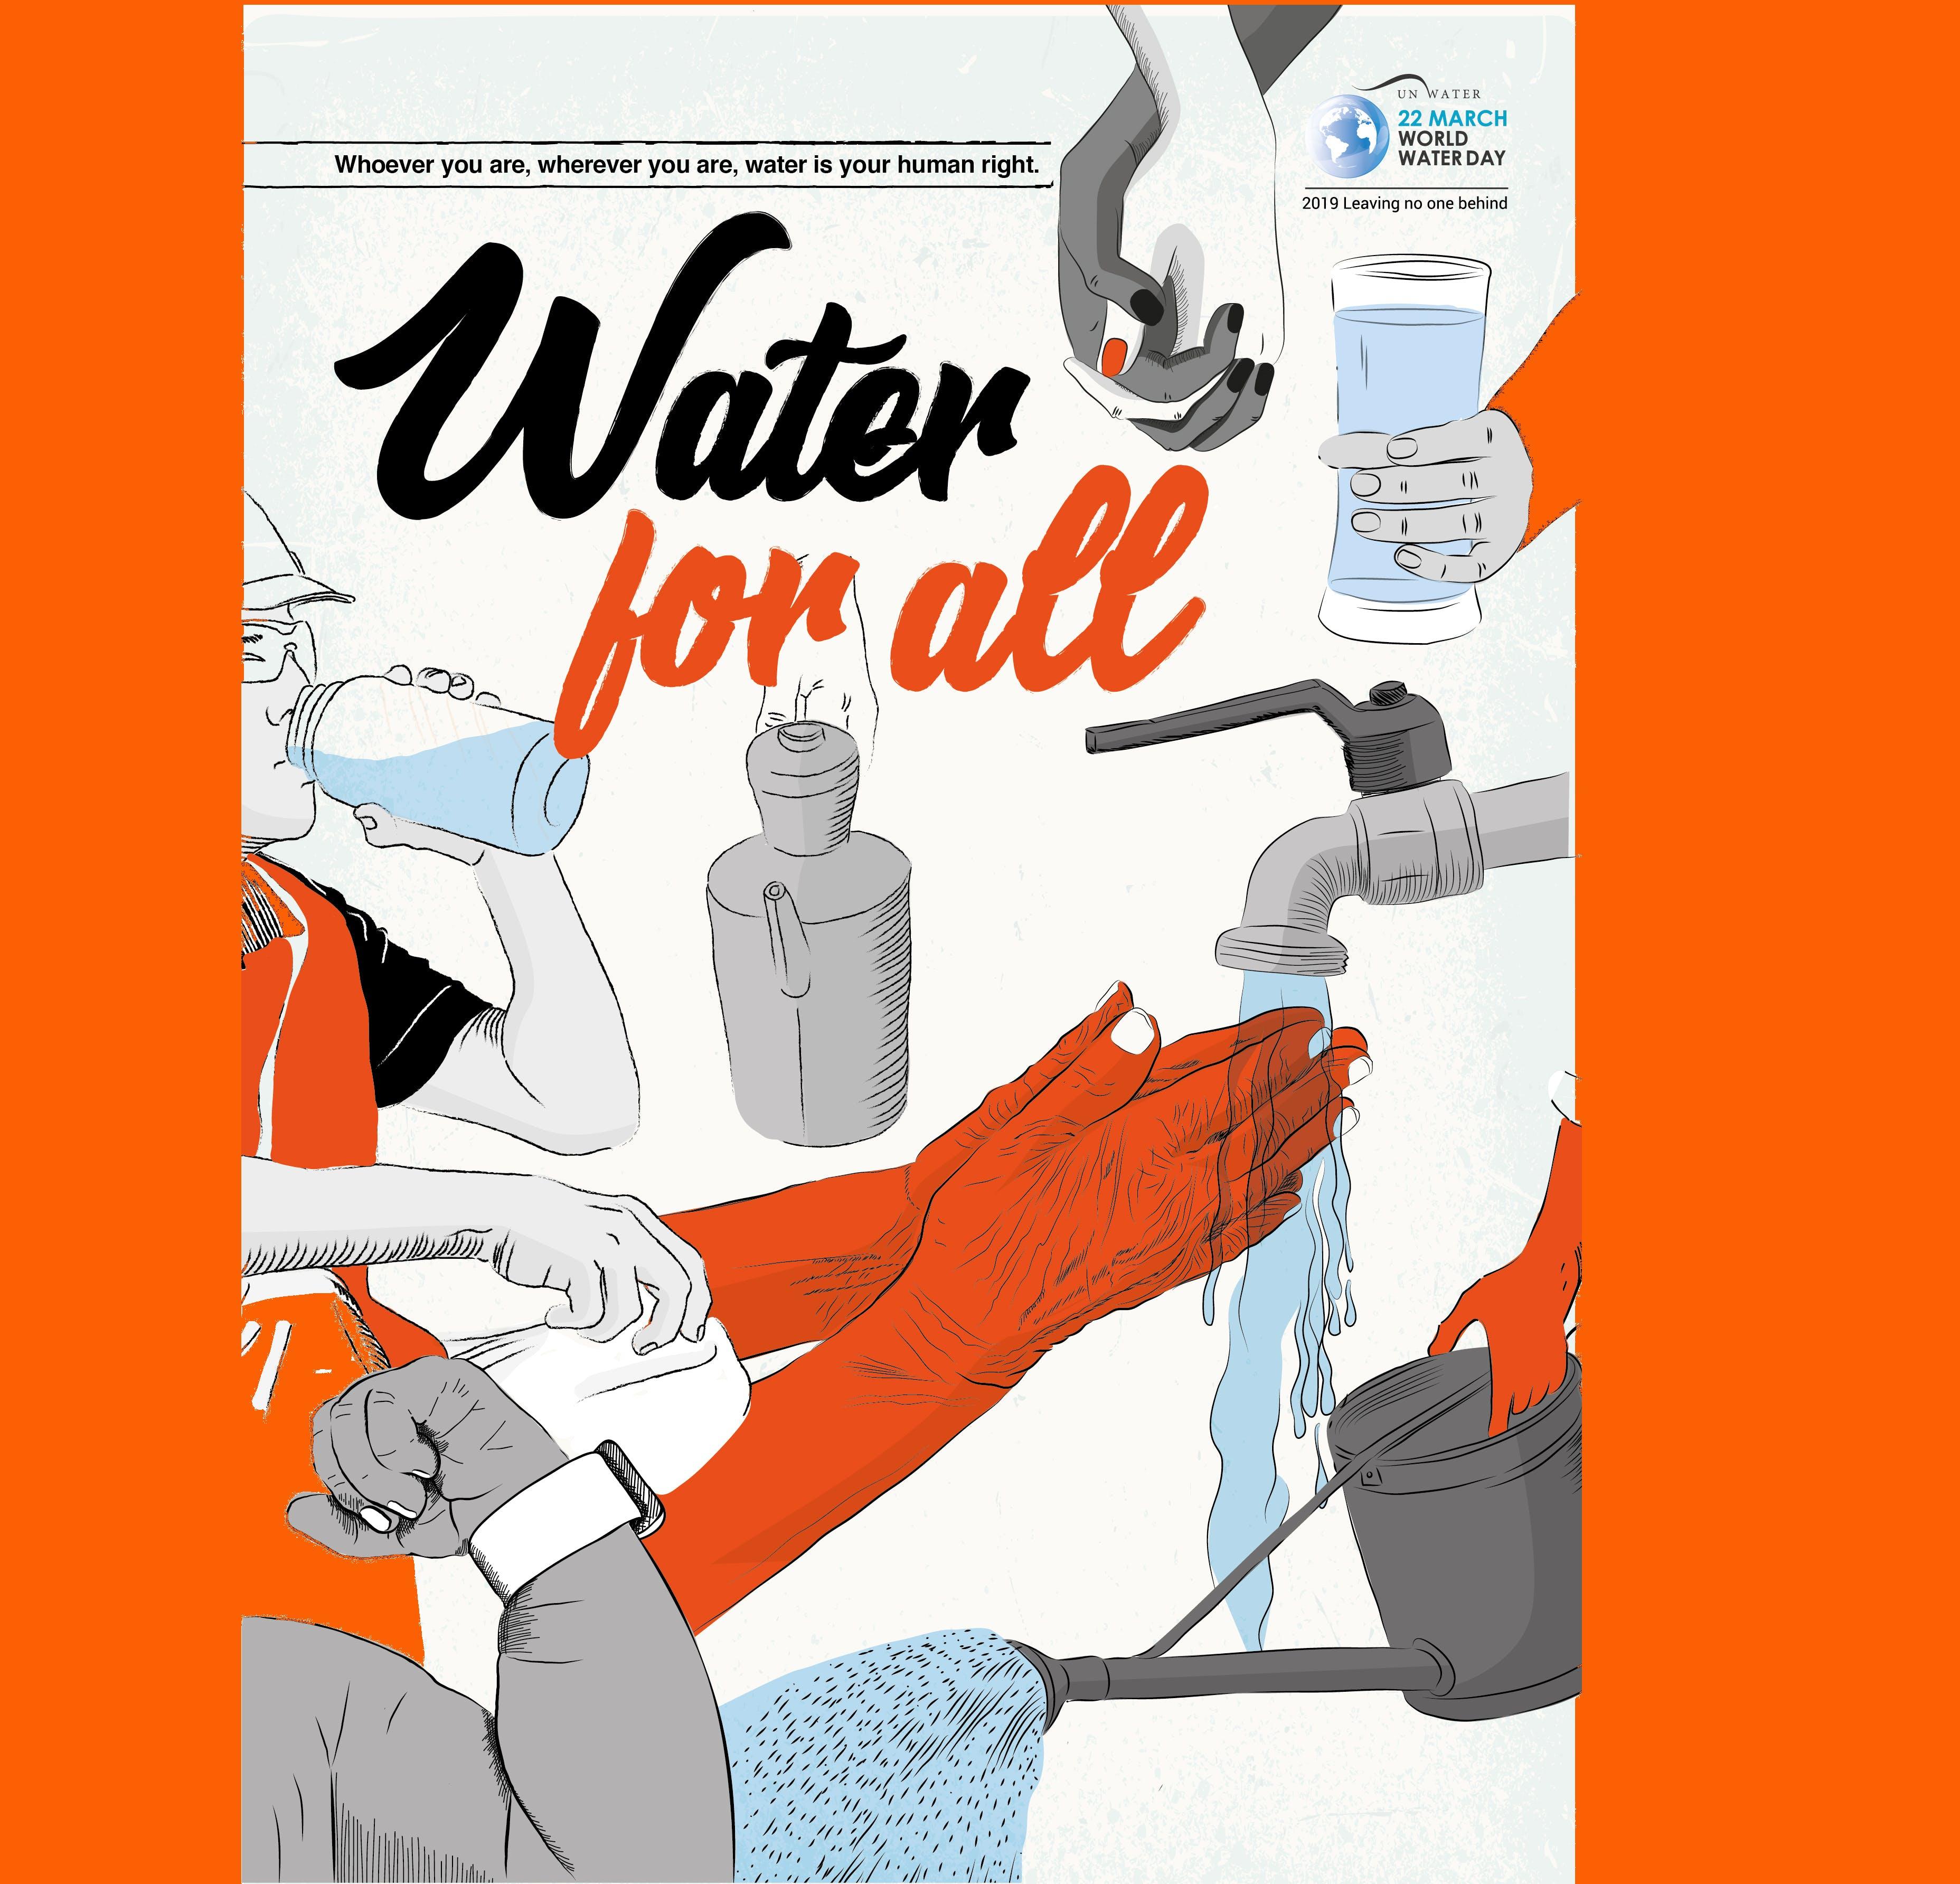 World Water Day YEG 2019